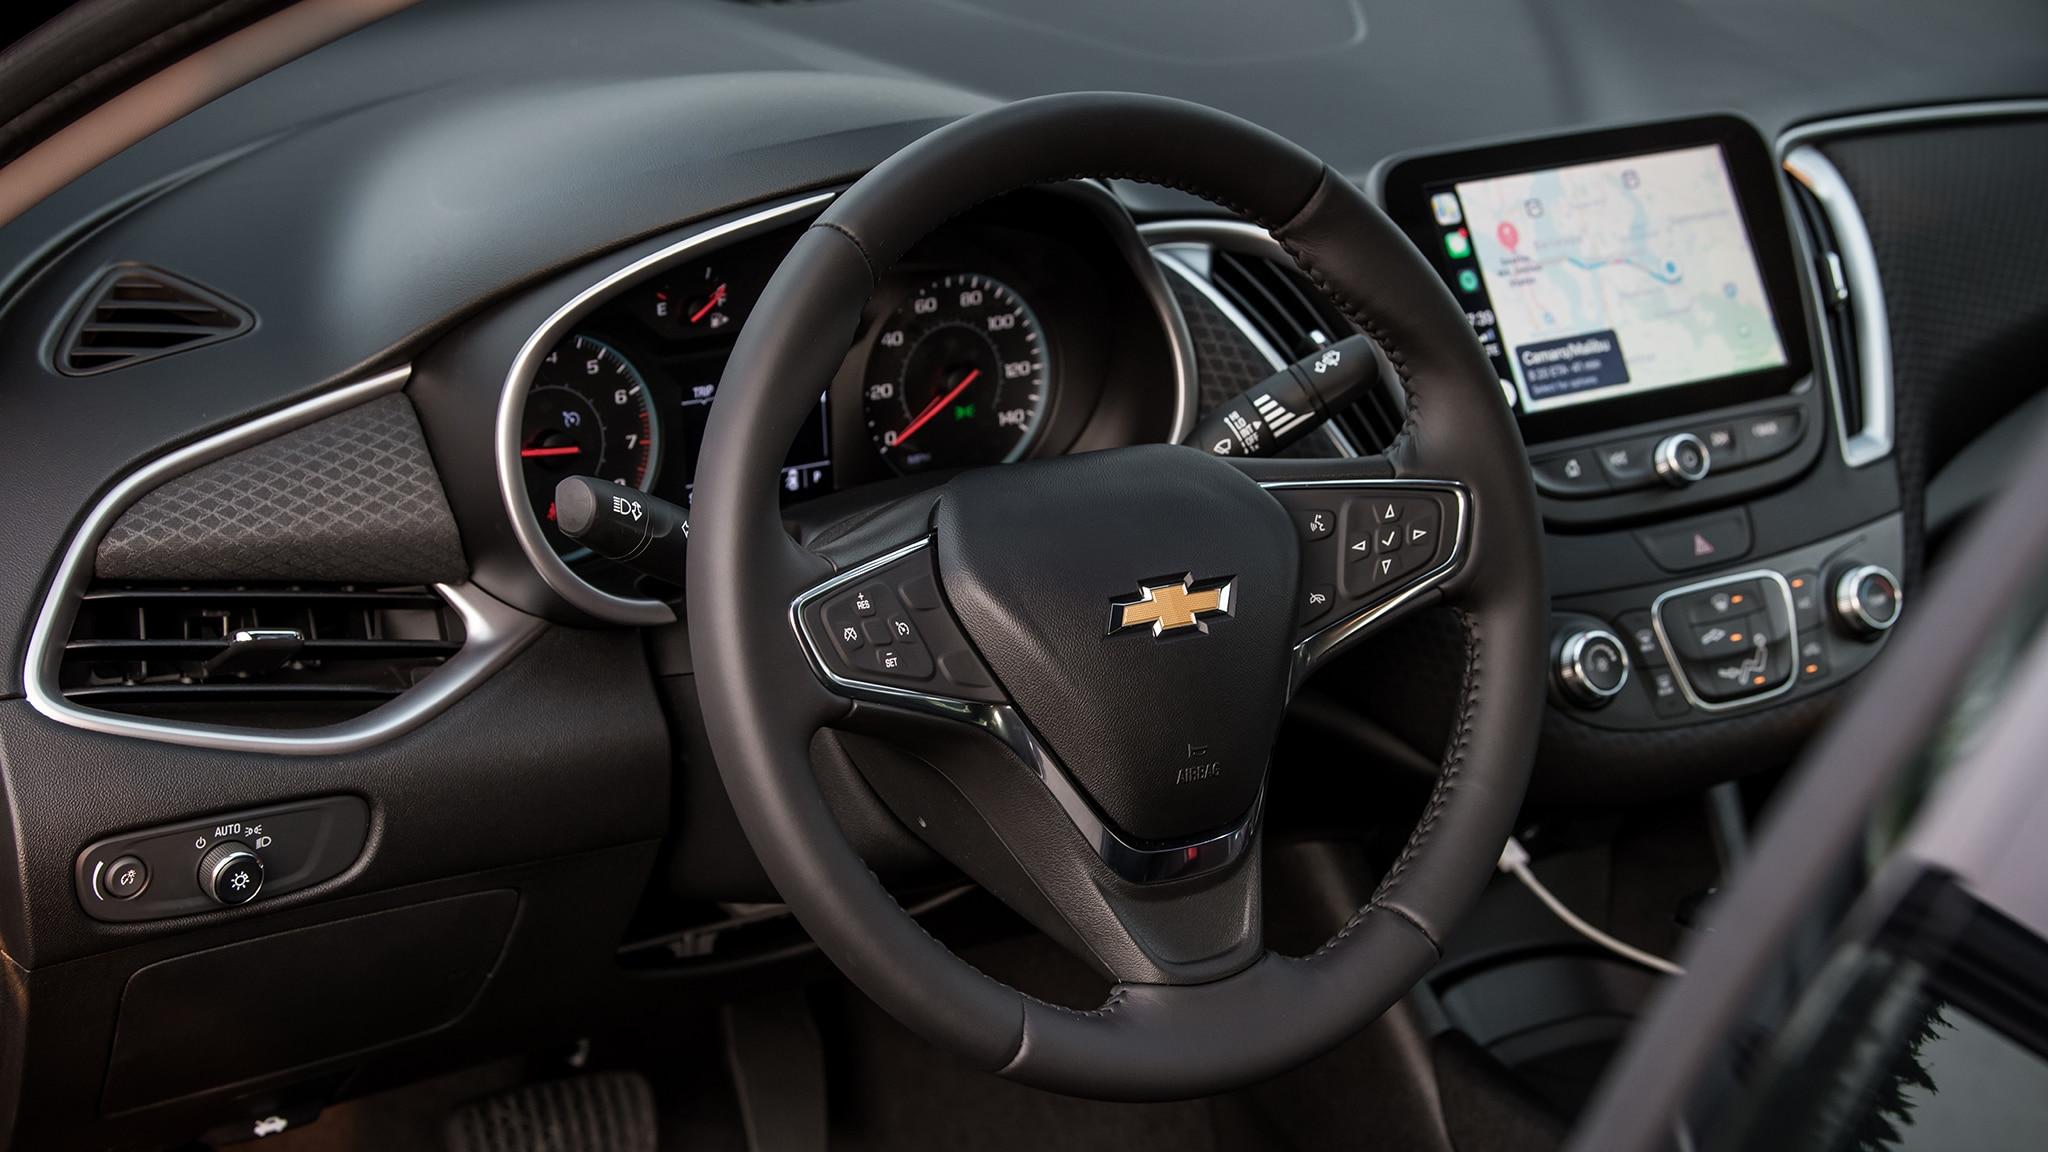 First Drive: 2019 Chevrolet Malibu RS   Automobile Magazine